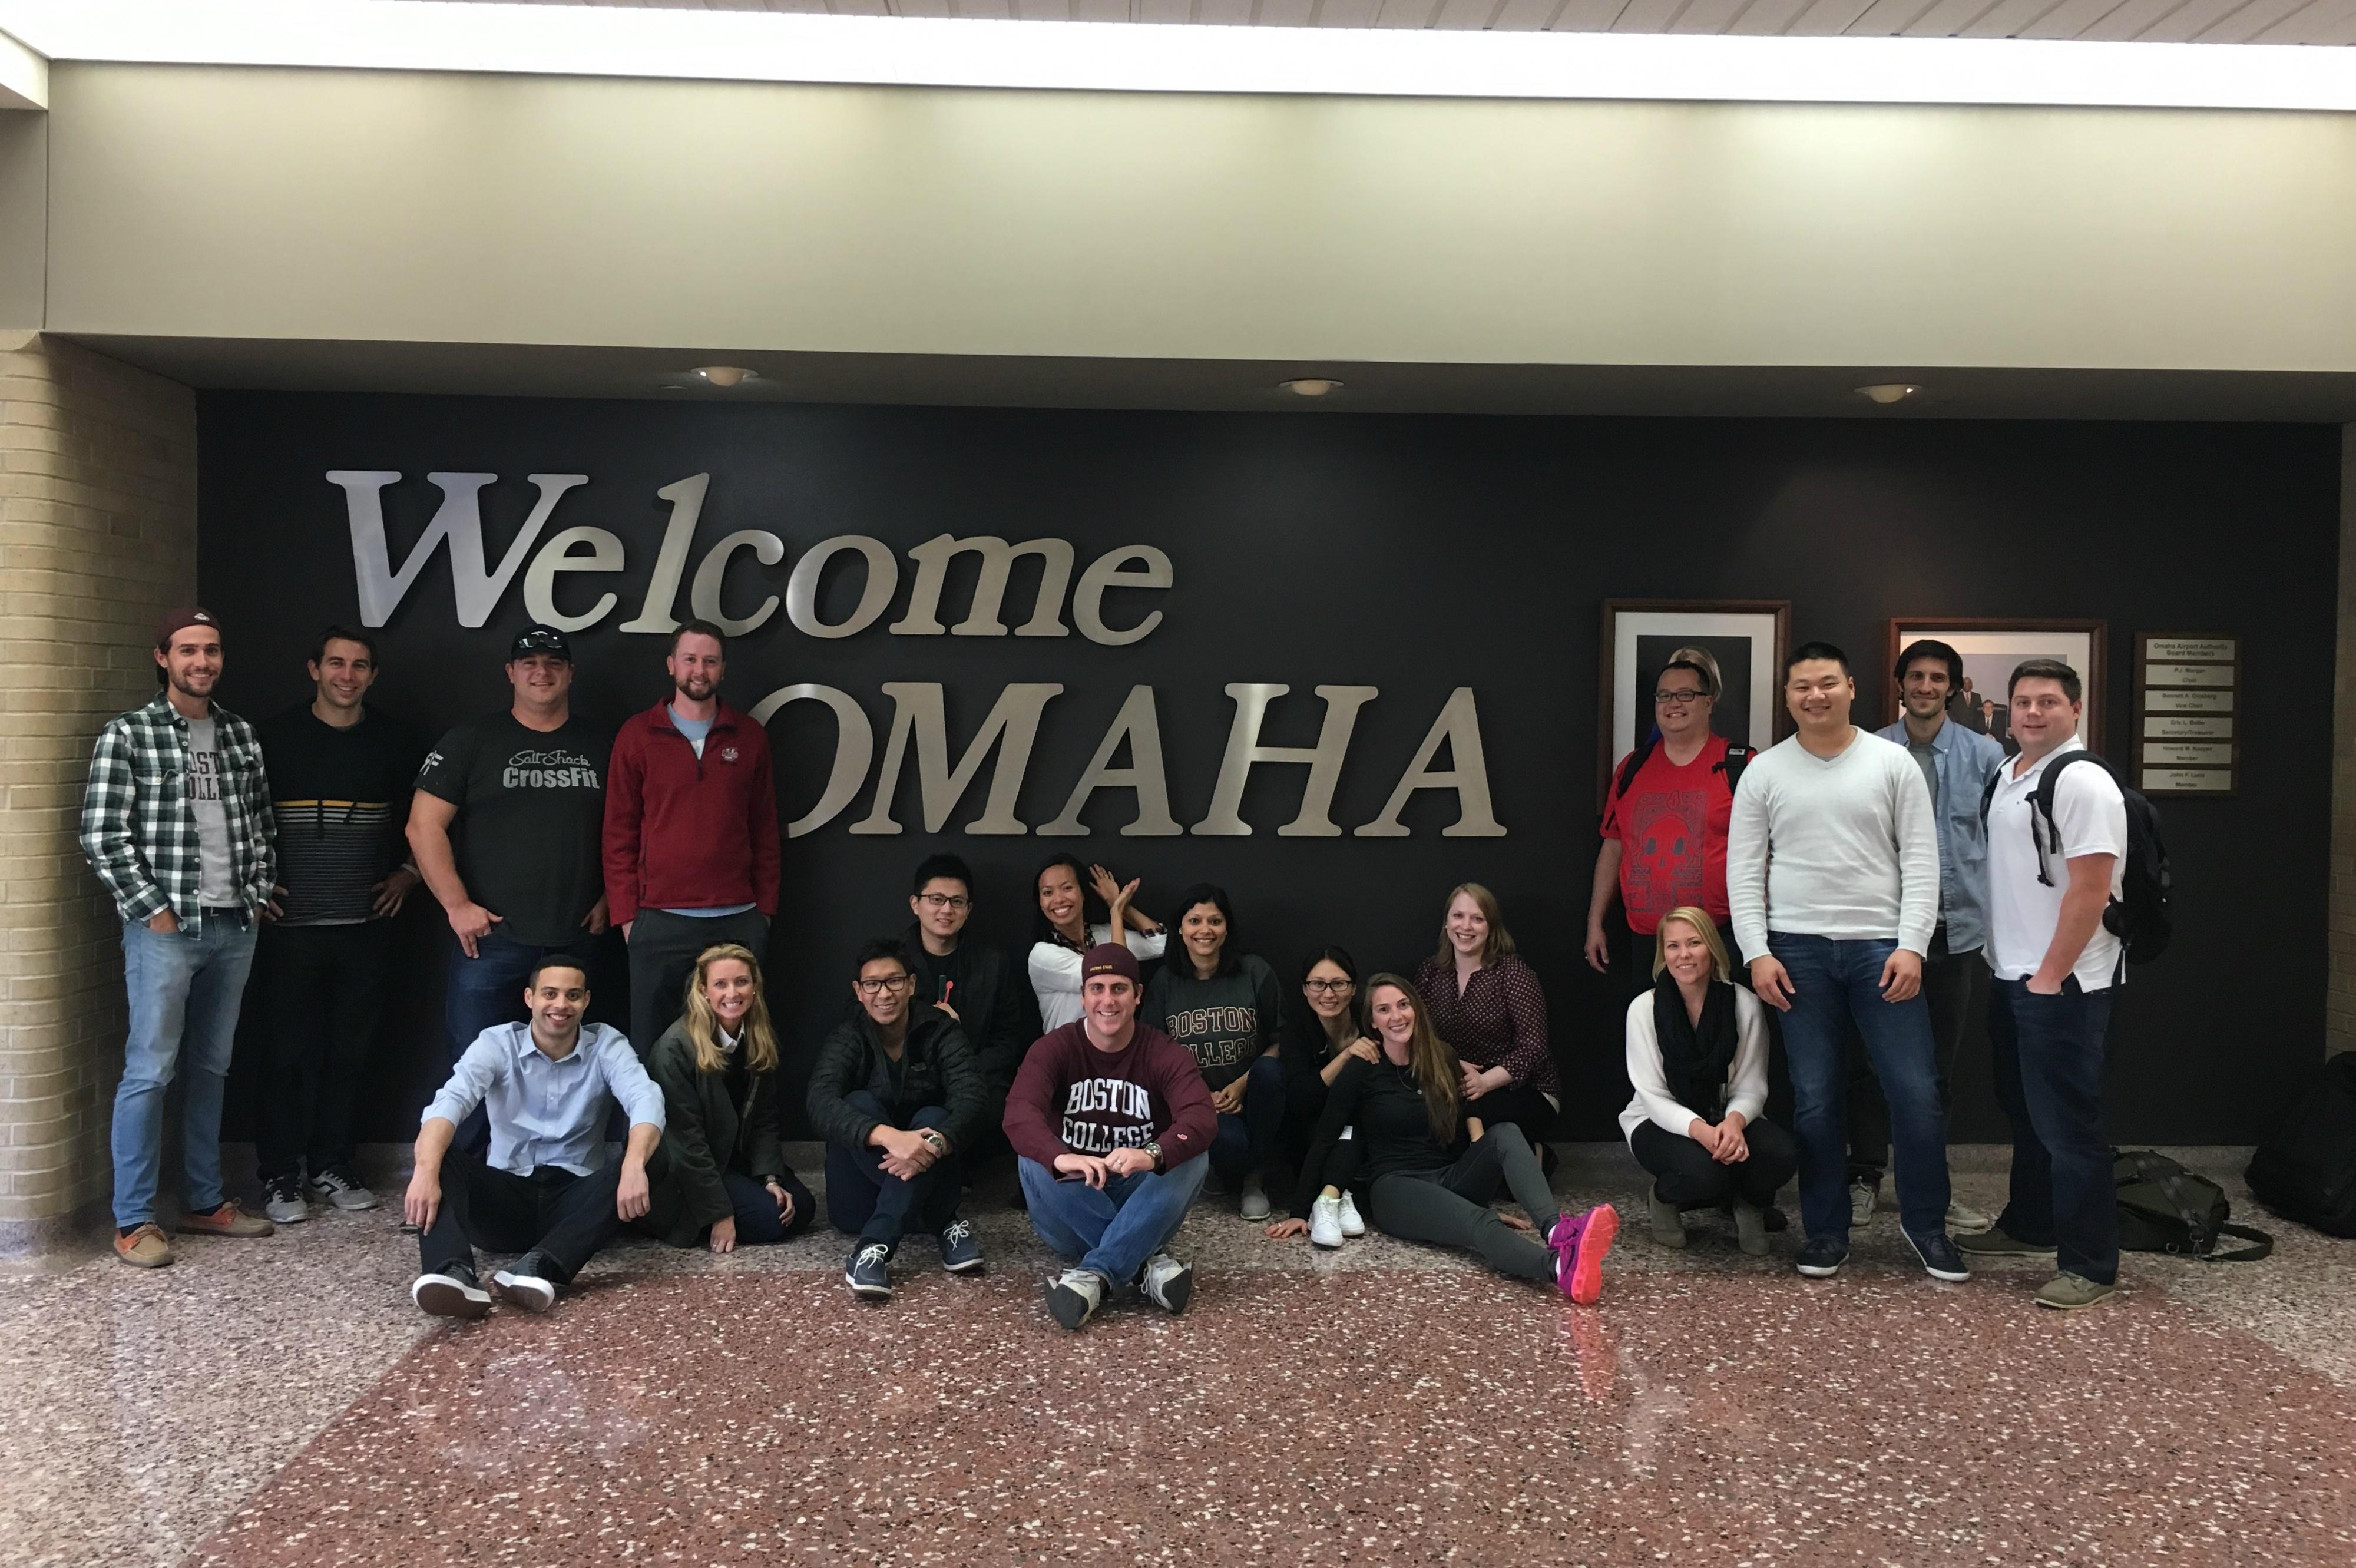 Omaha Airport.jpg